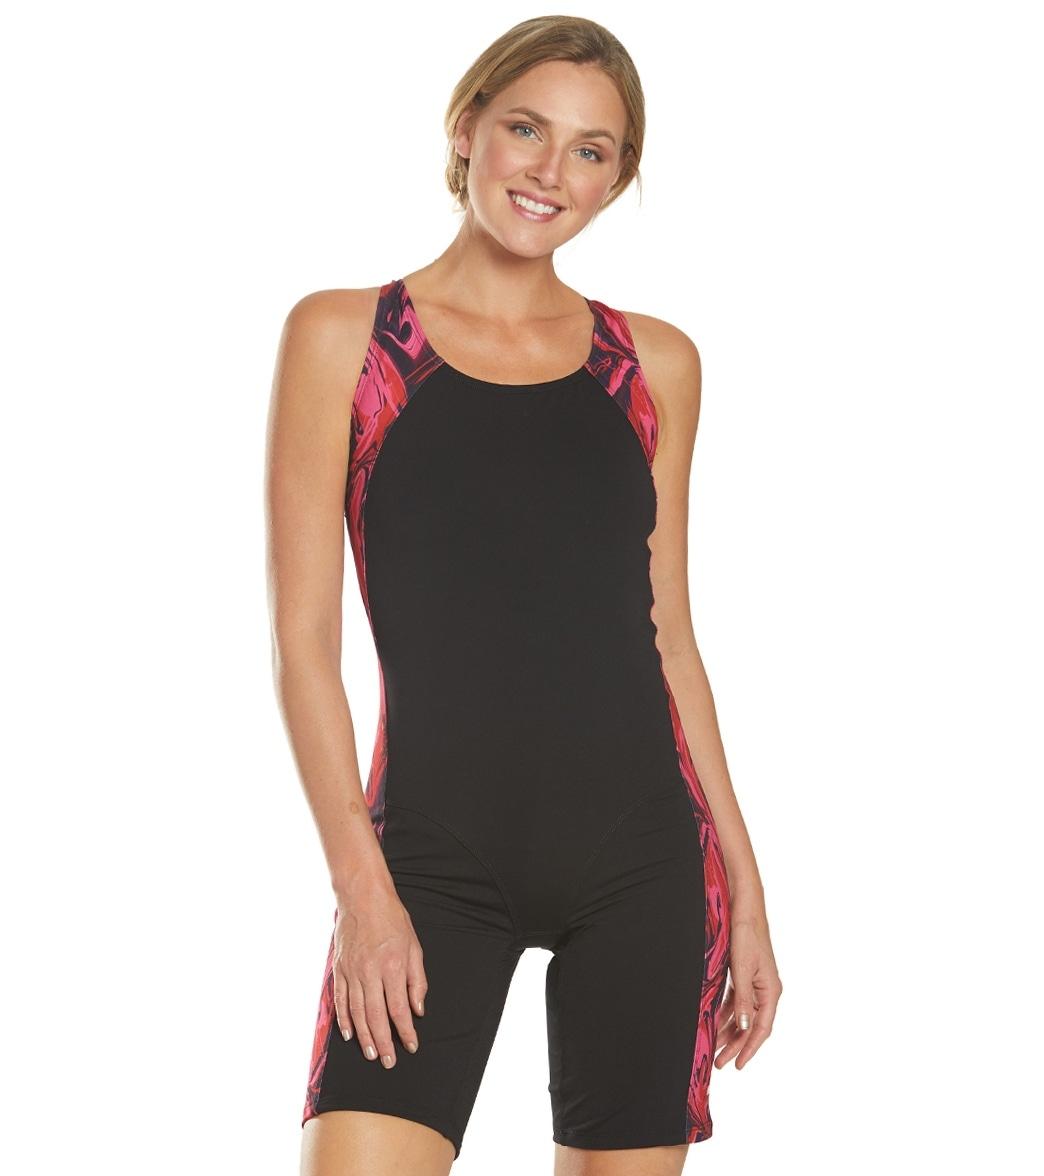 cf6a6a5cb9c EQ Swimwear Spectrum Unitard Swimsuit at SwimOutlet.com - Free Shipping